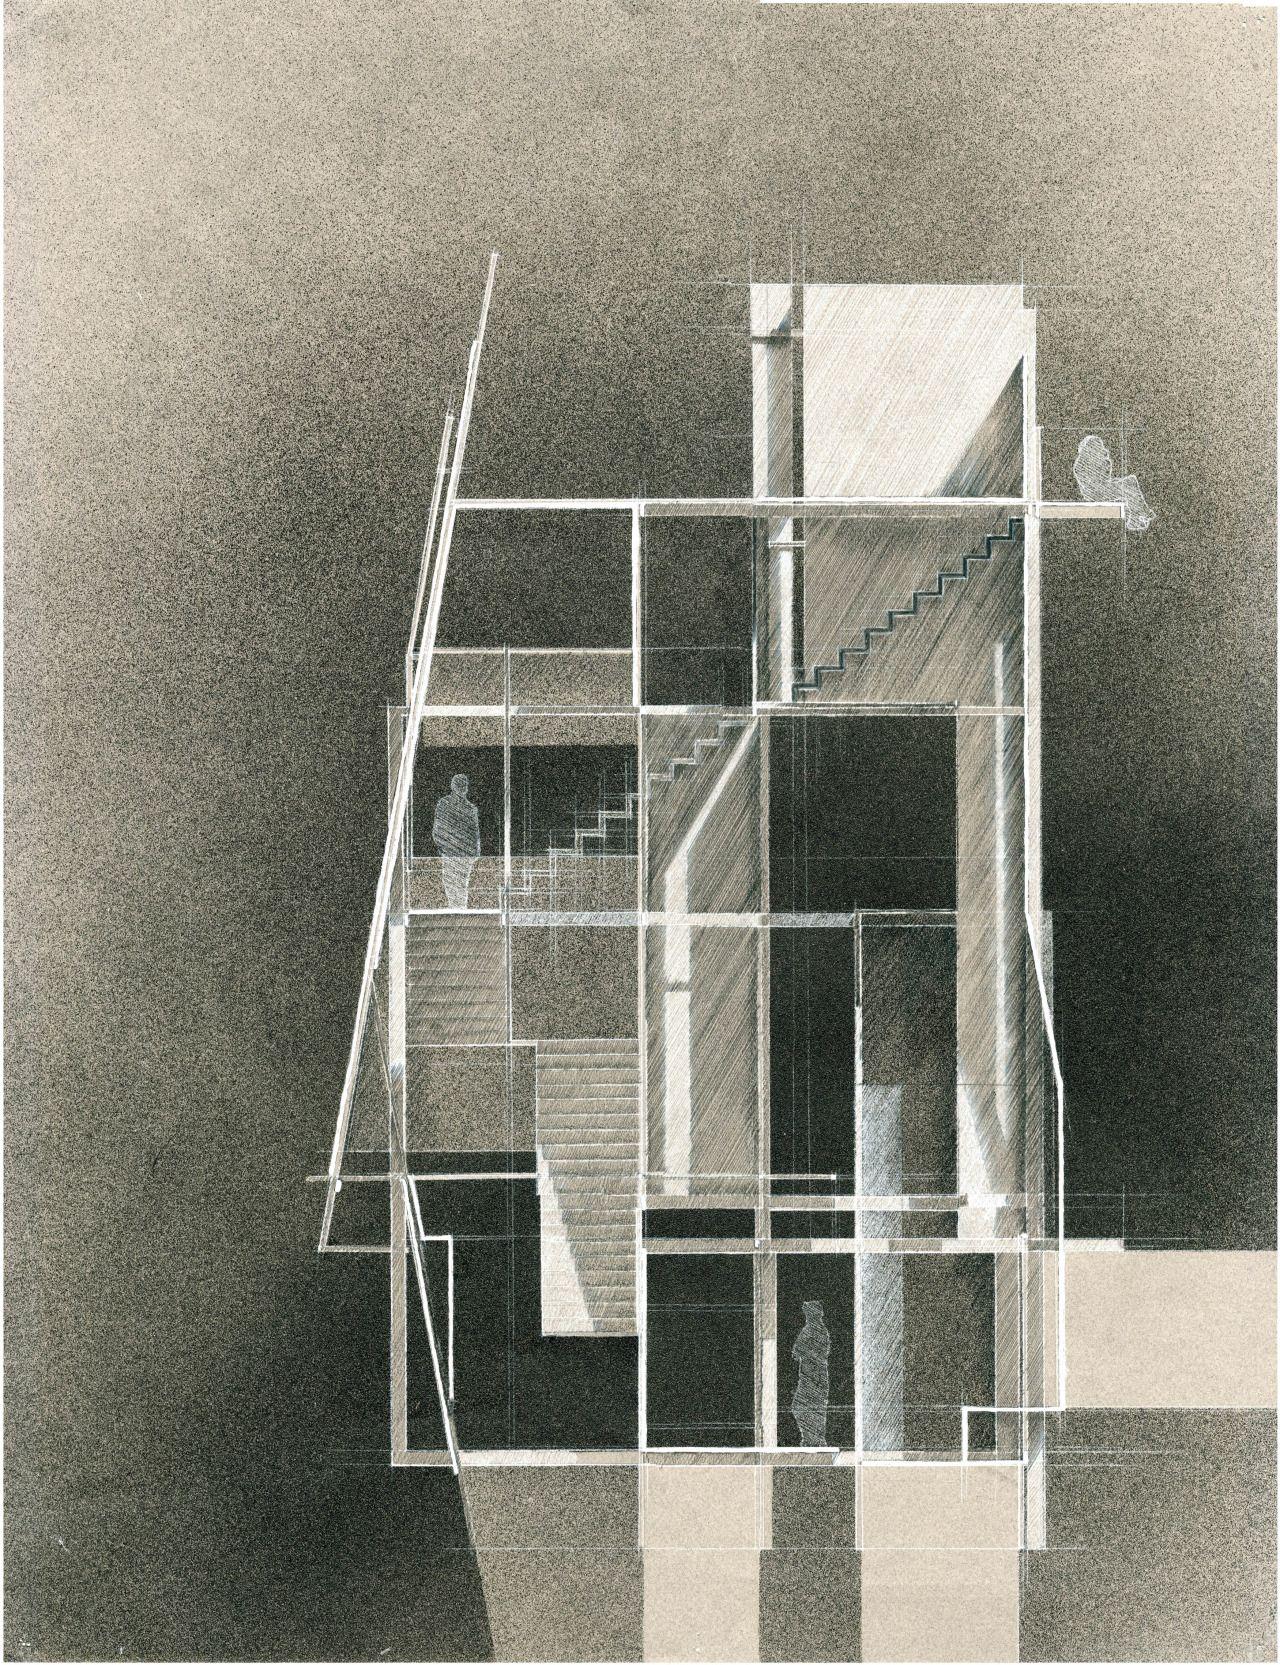 UF Architecture John Fechtel BDesign in Architecture 2015 UF